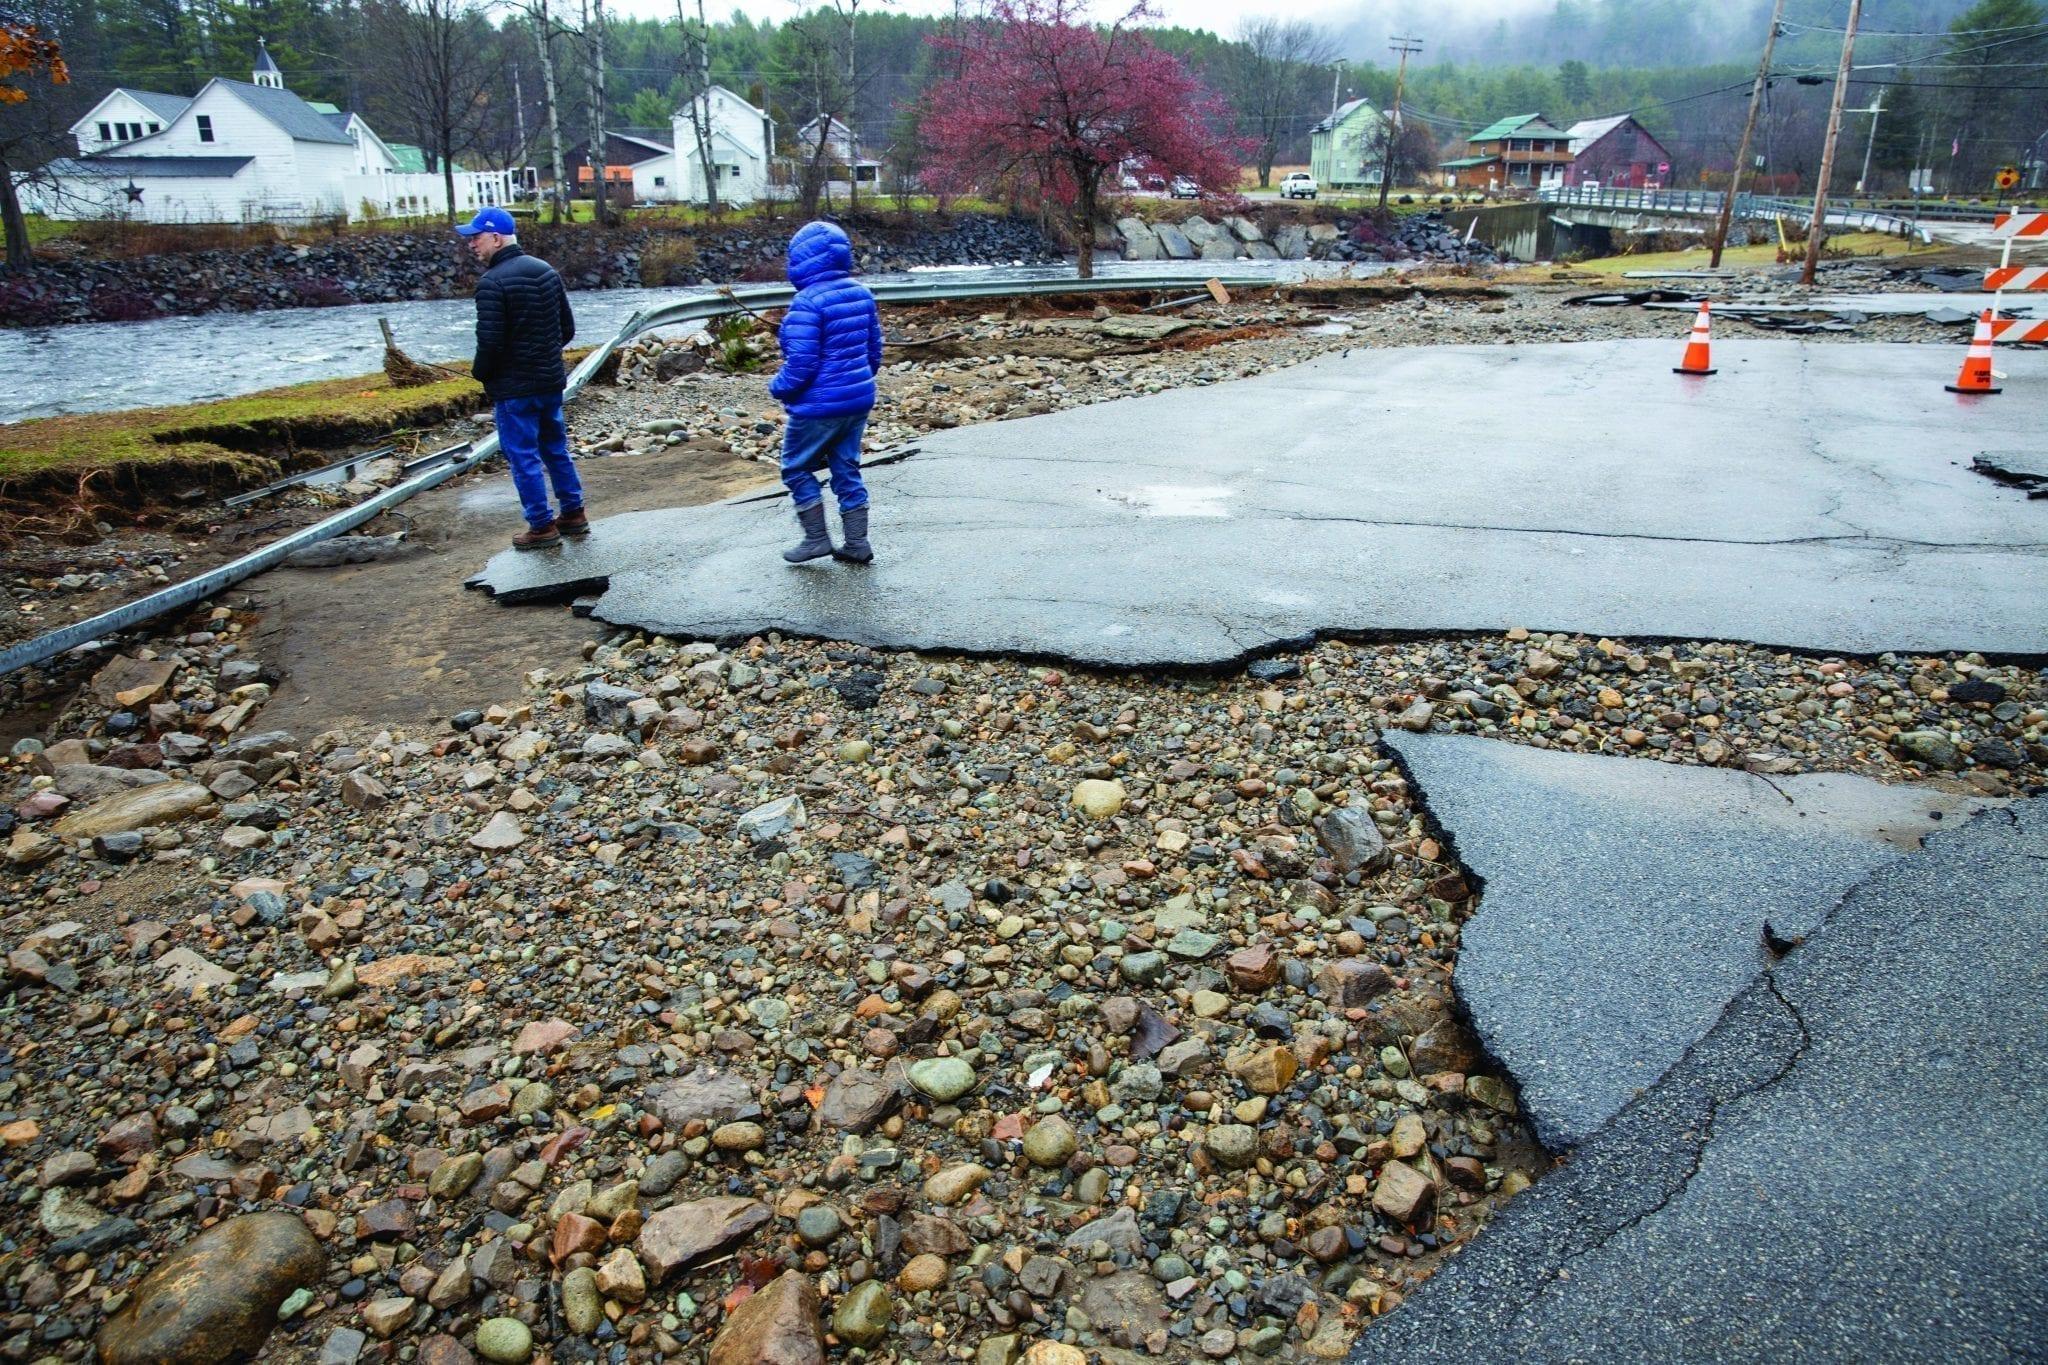 The Adirondack flood of the future?